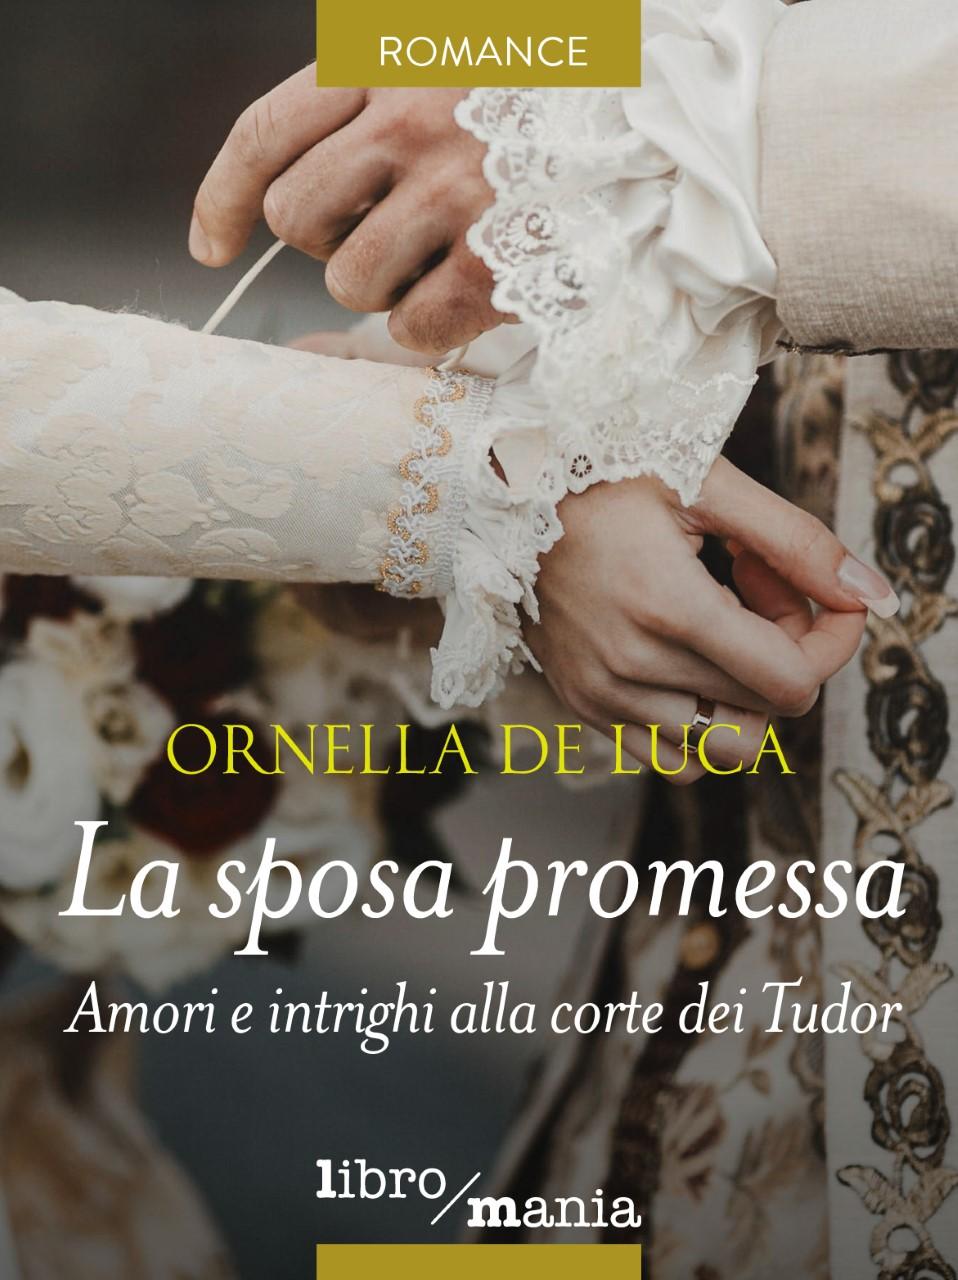 thumbnail_De Luca_La sposa promessa_ROMANCE.jpg